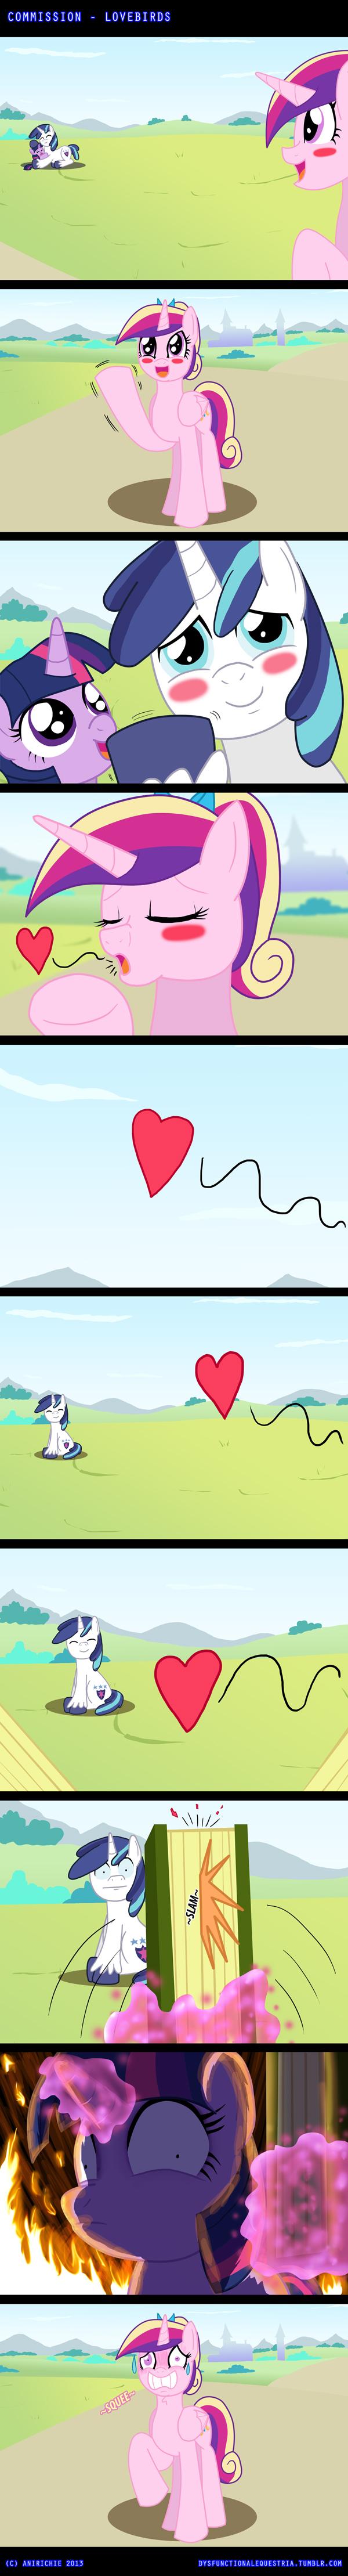 COM - Lovebirds (COMIC)